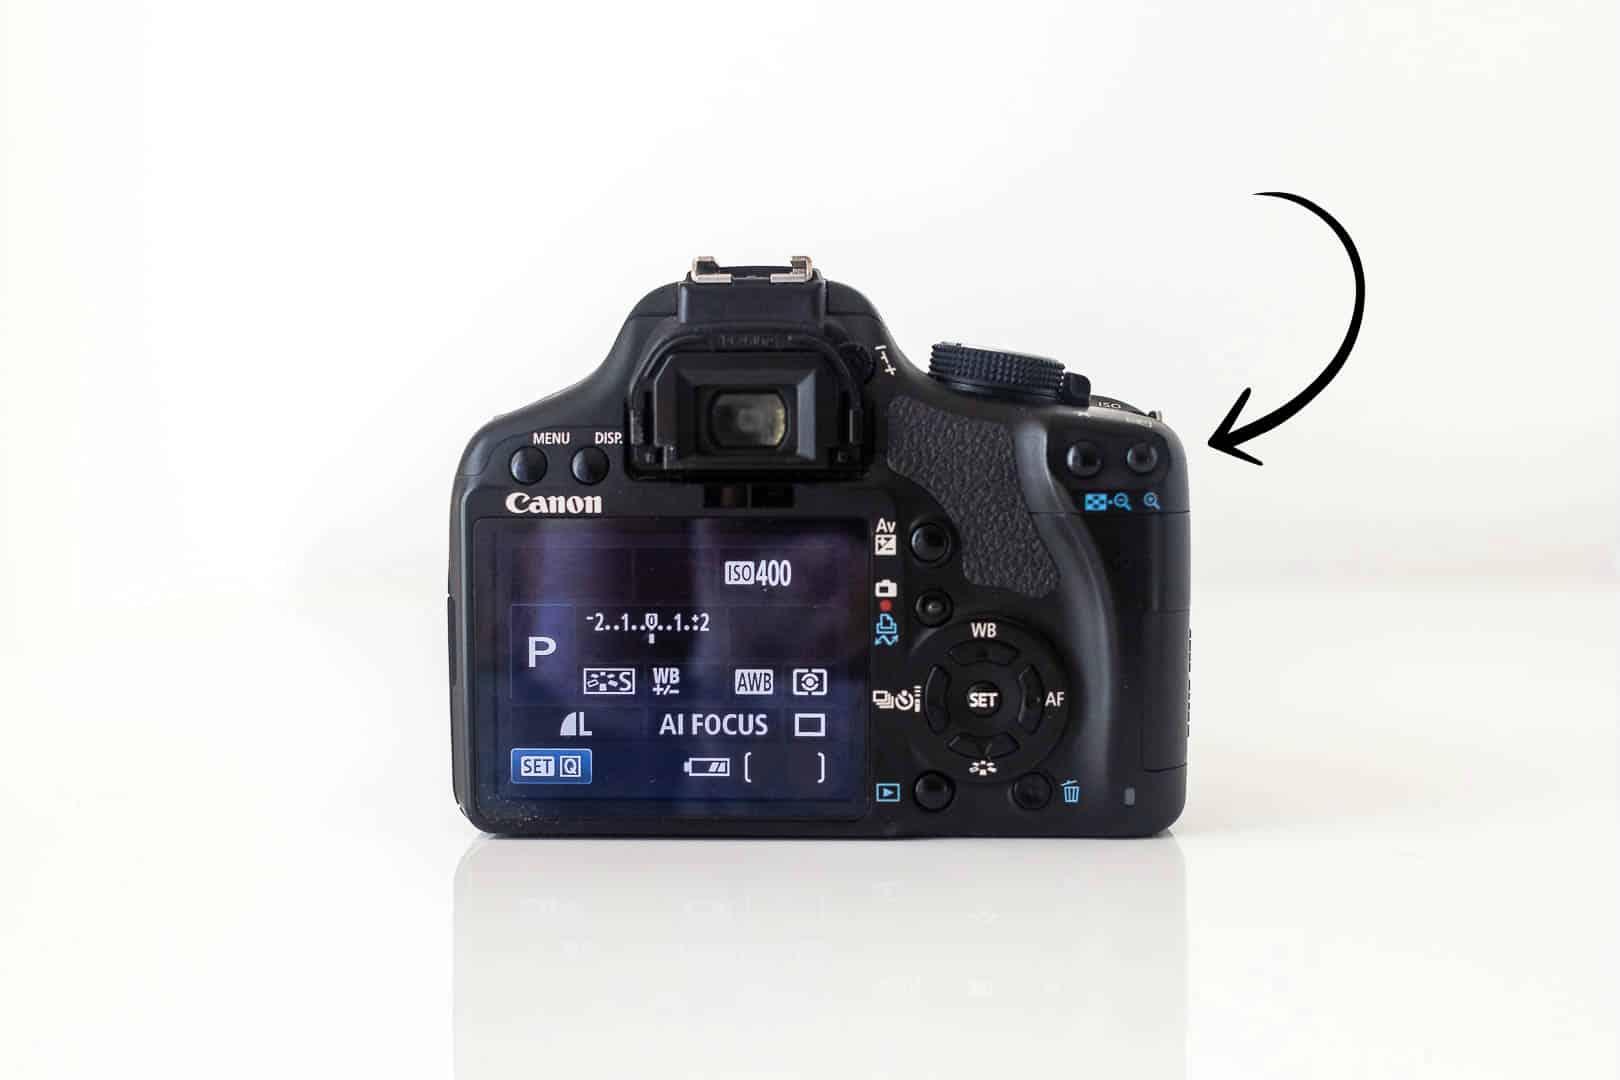 canon kamera-spejlrefleks-foto-kursus